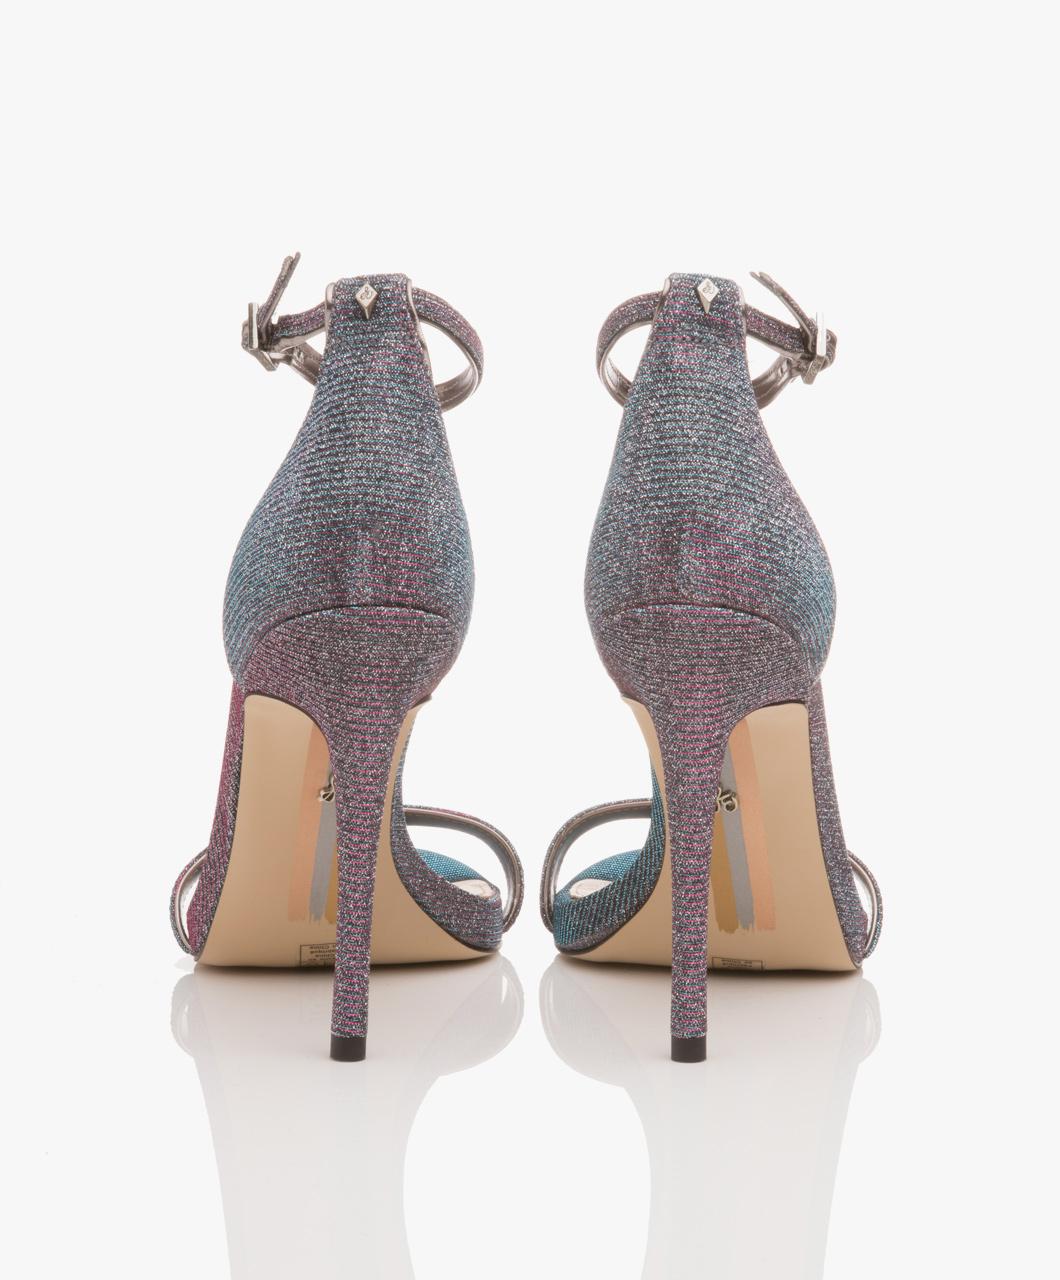 9132876fc4aa Sam Edelman Ariella Flash Glitz Ankle Strap Sandals - Pink Blue Multi -  ariella pink  multi